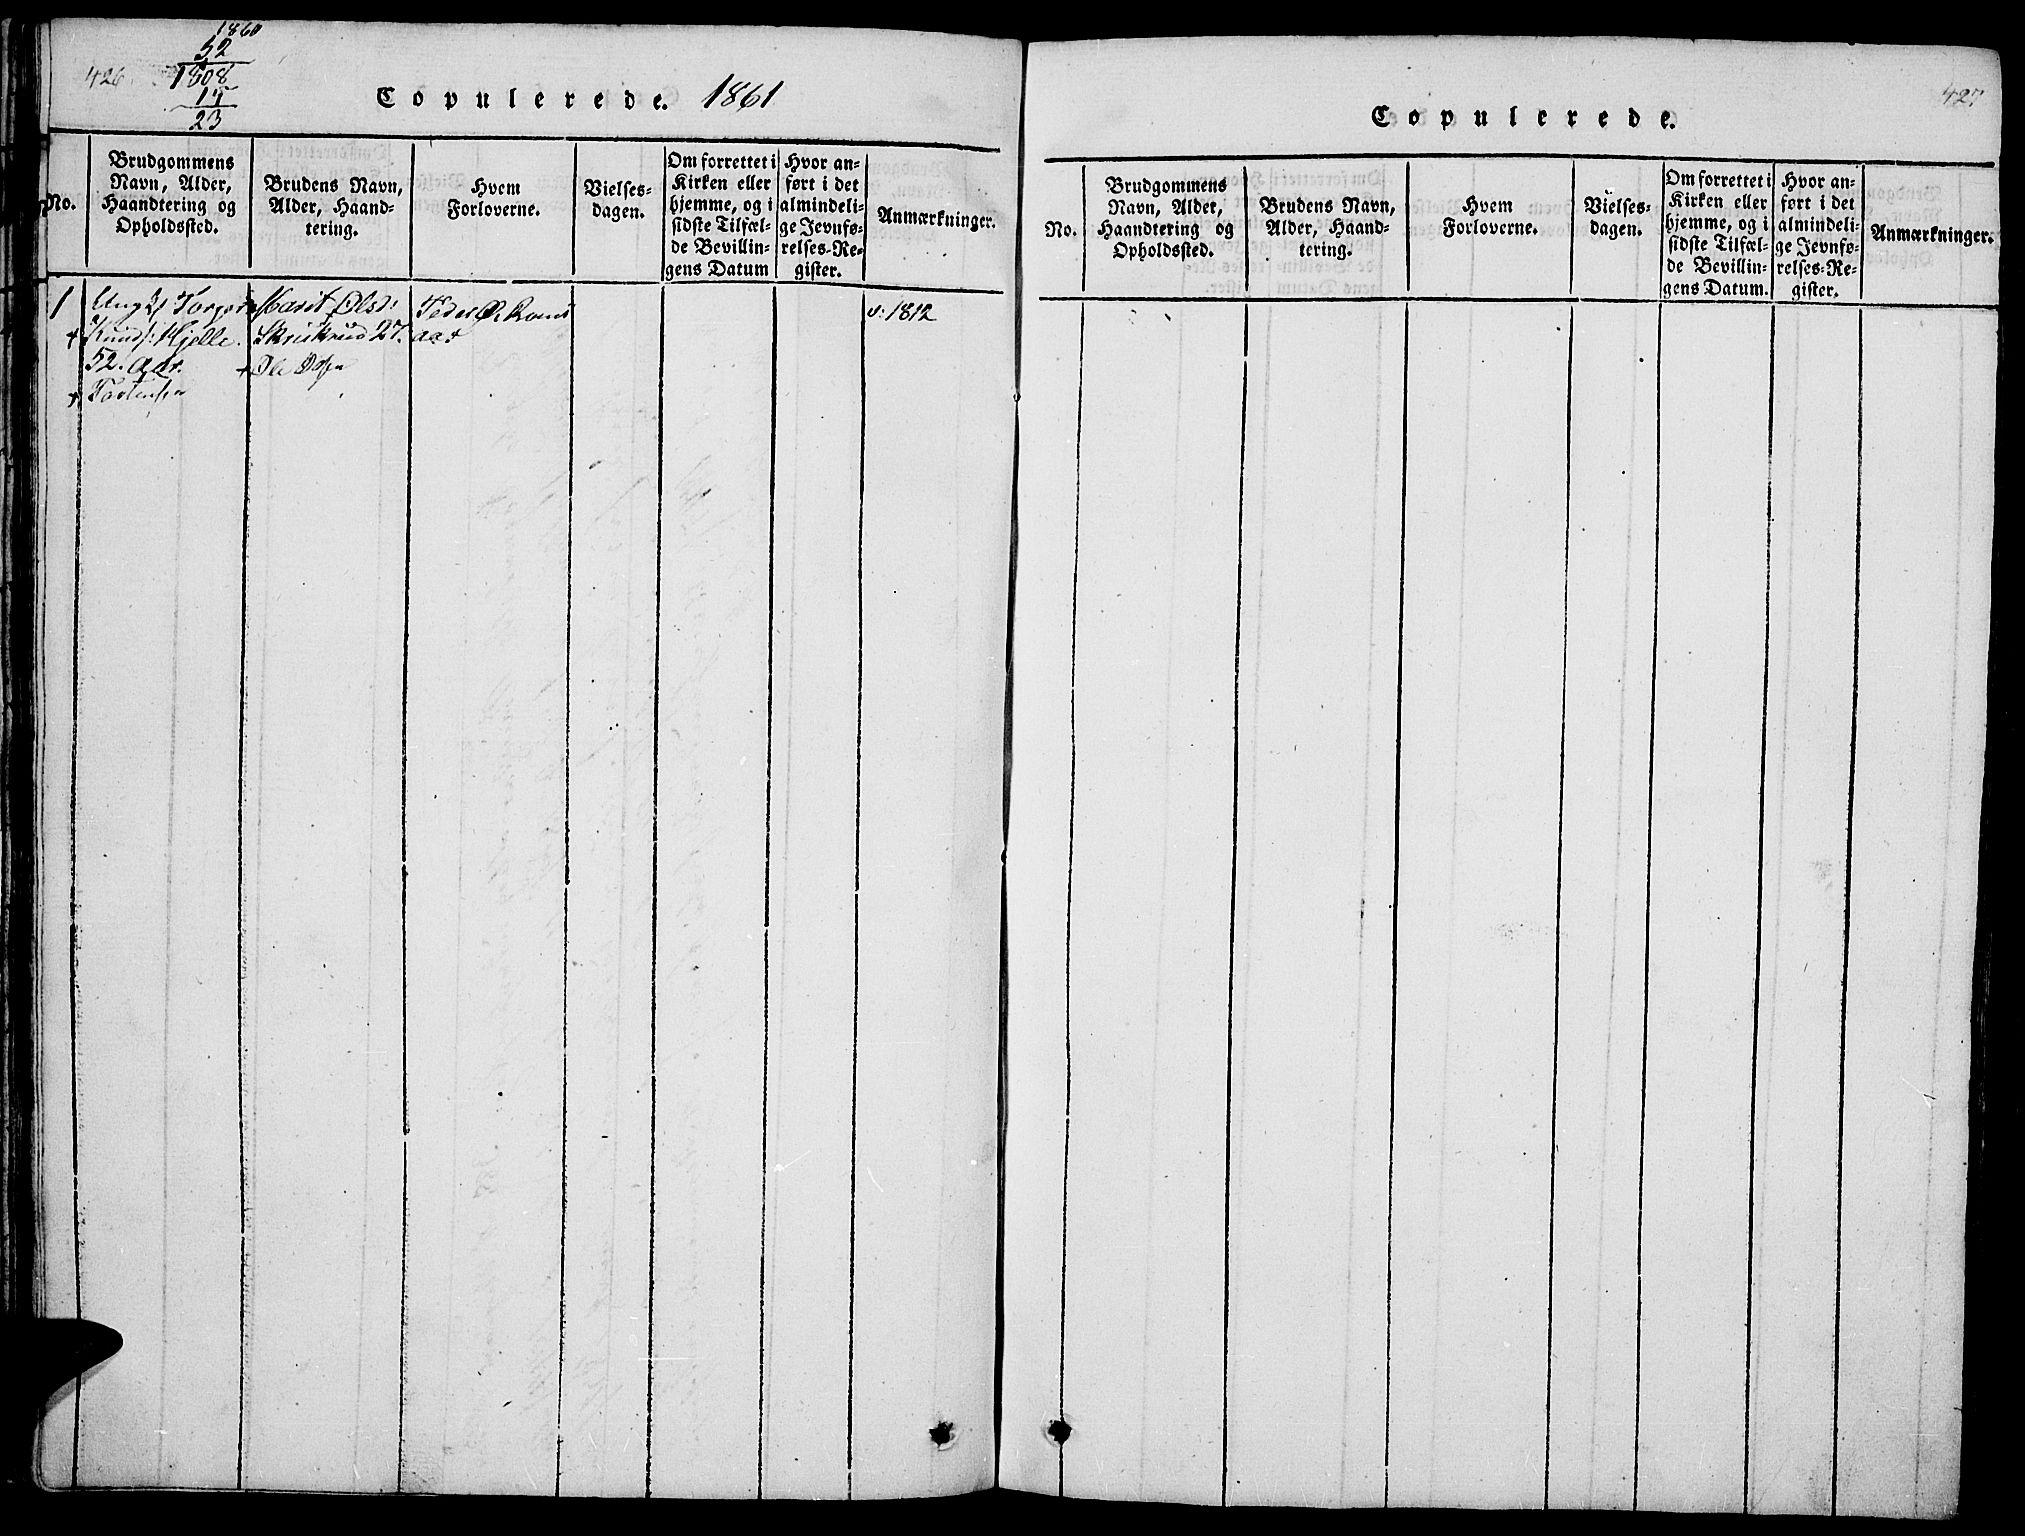 SAH, Ringebu prestekontor, Klokkerbok nr. 1, 1821-1839, s. 426-427